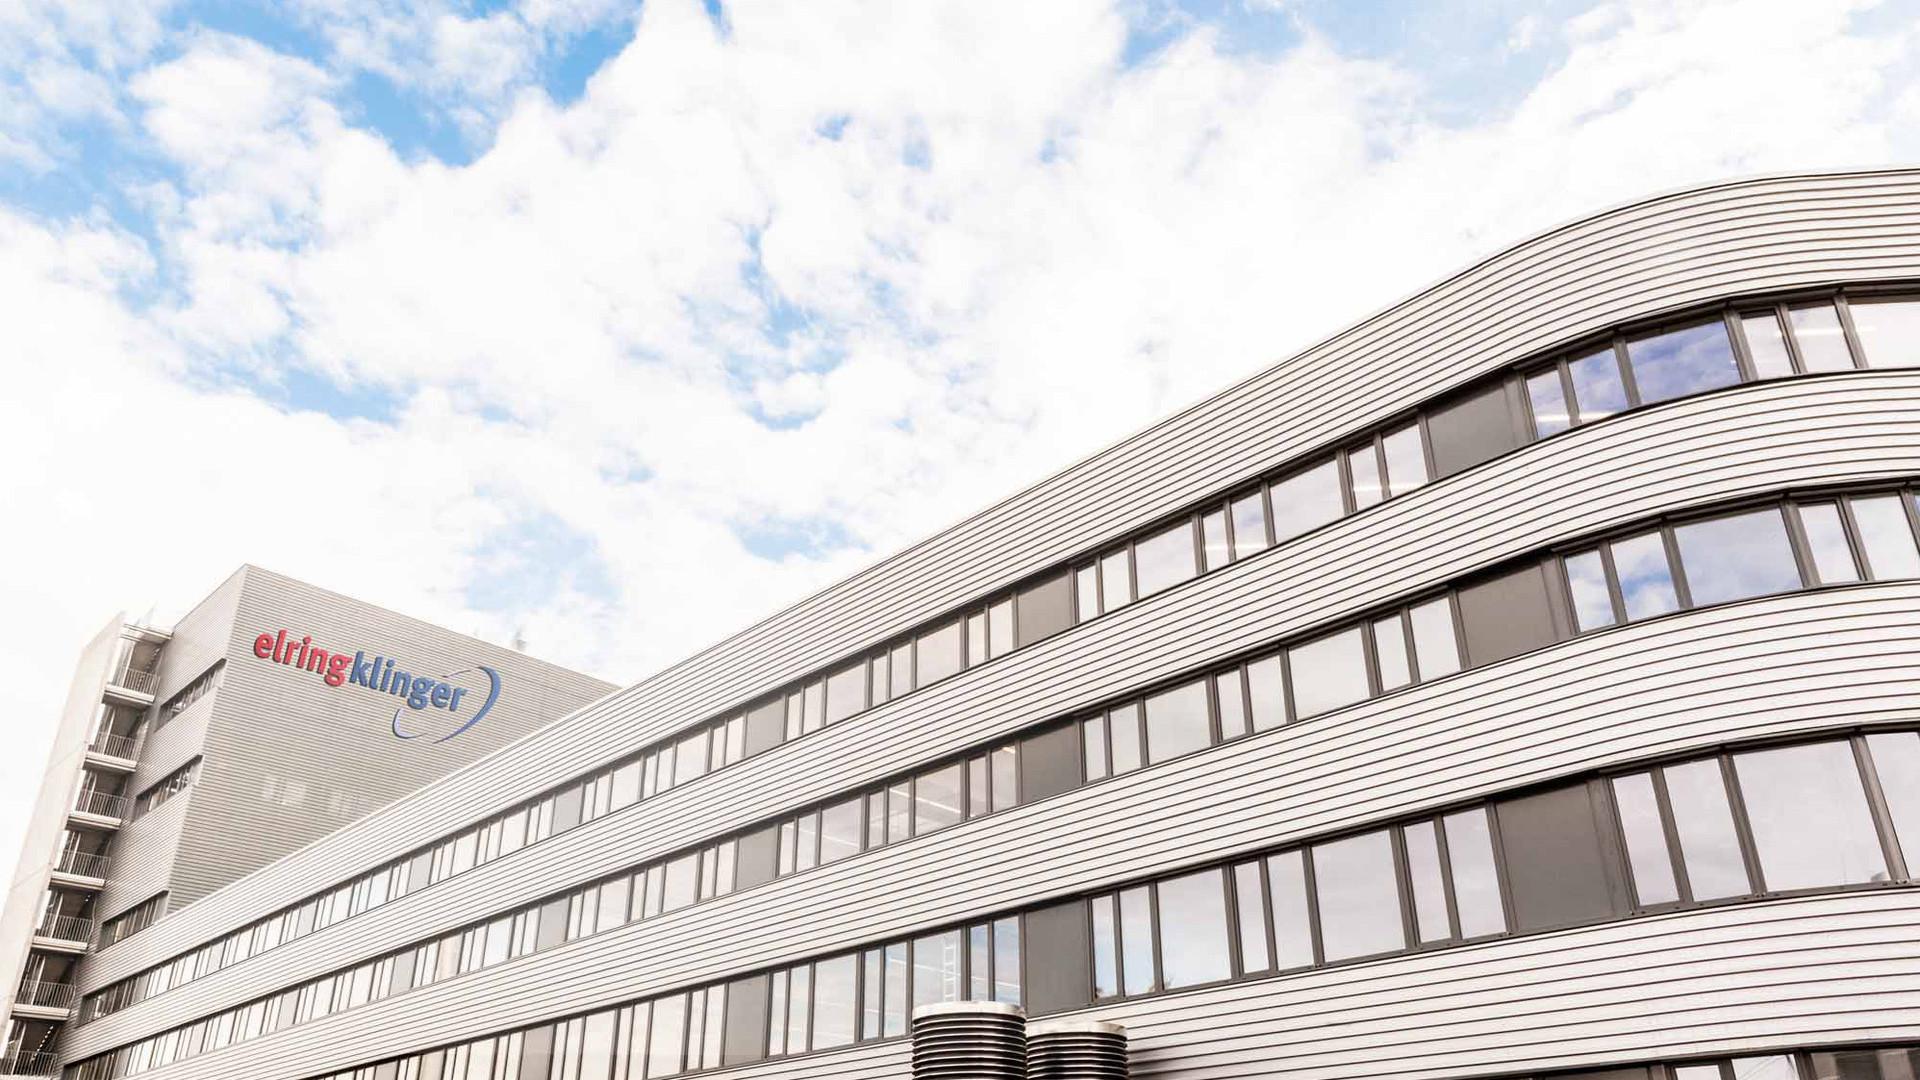 ElringKlinger Kunststofftechnik GmbH Bietigheim-Bissingen new production building